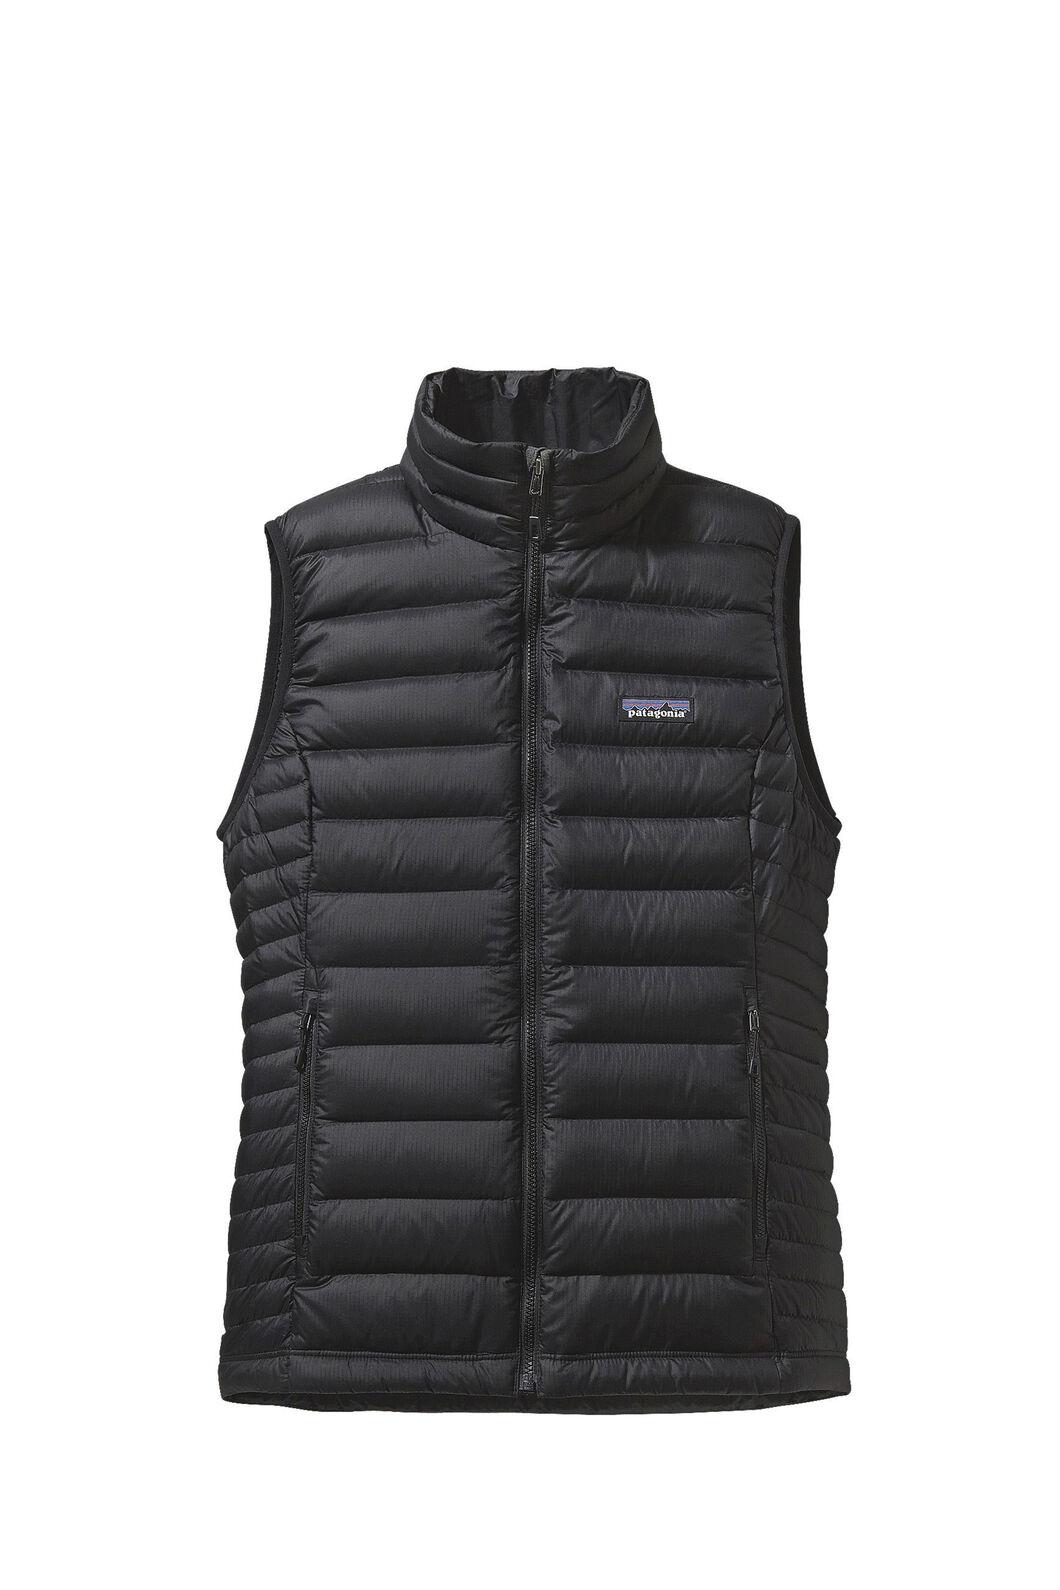 Patagonia Down Sweater Vest — Women's, Black, hi-res